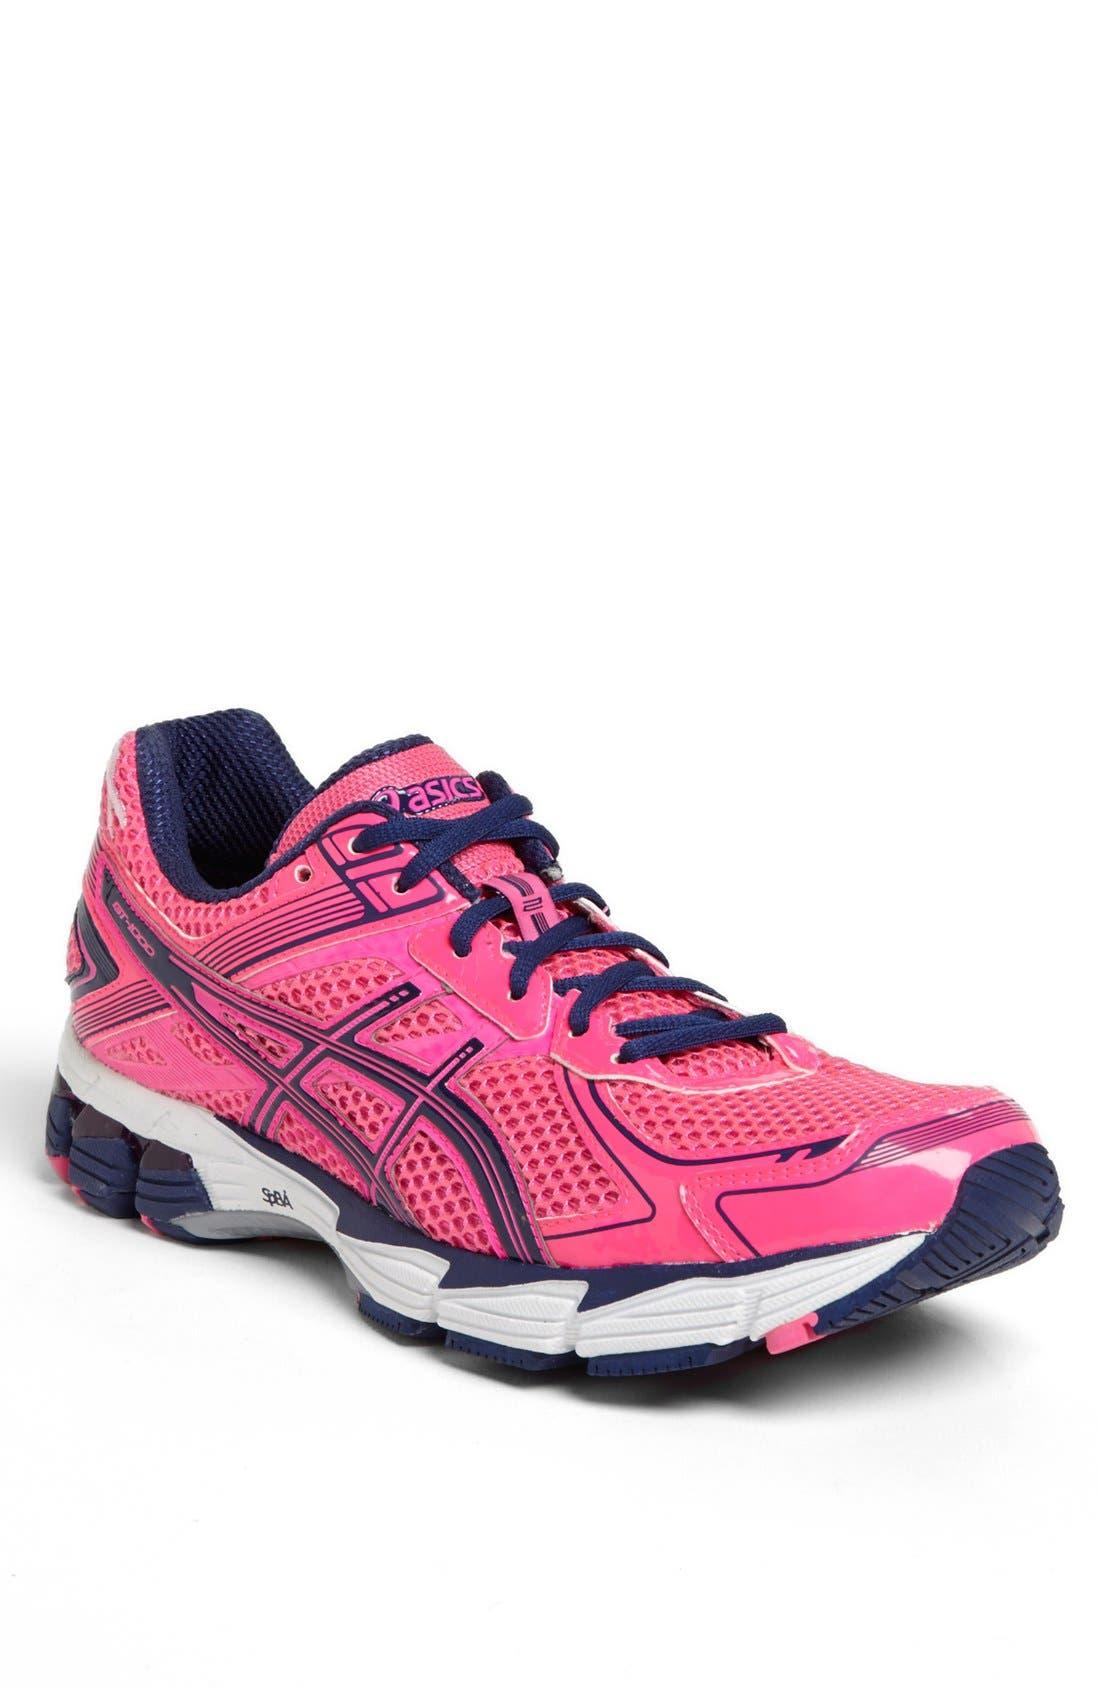 Main Image - ASICS® 'GT 1000 PR 2' Running Shoe (Men)